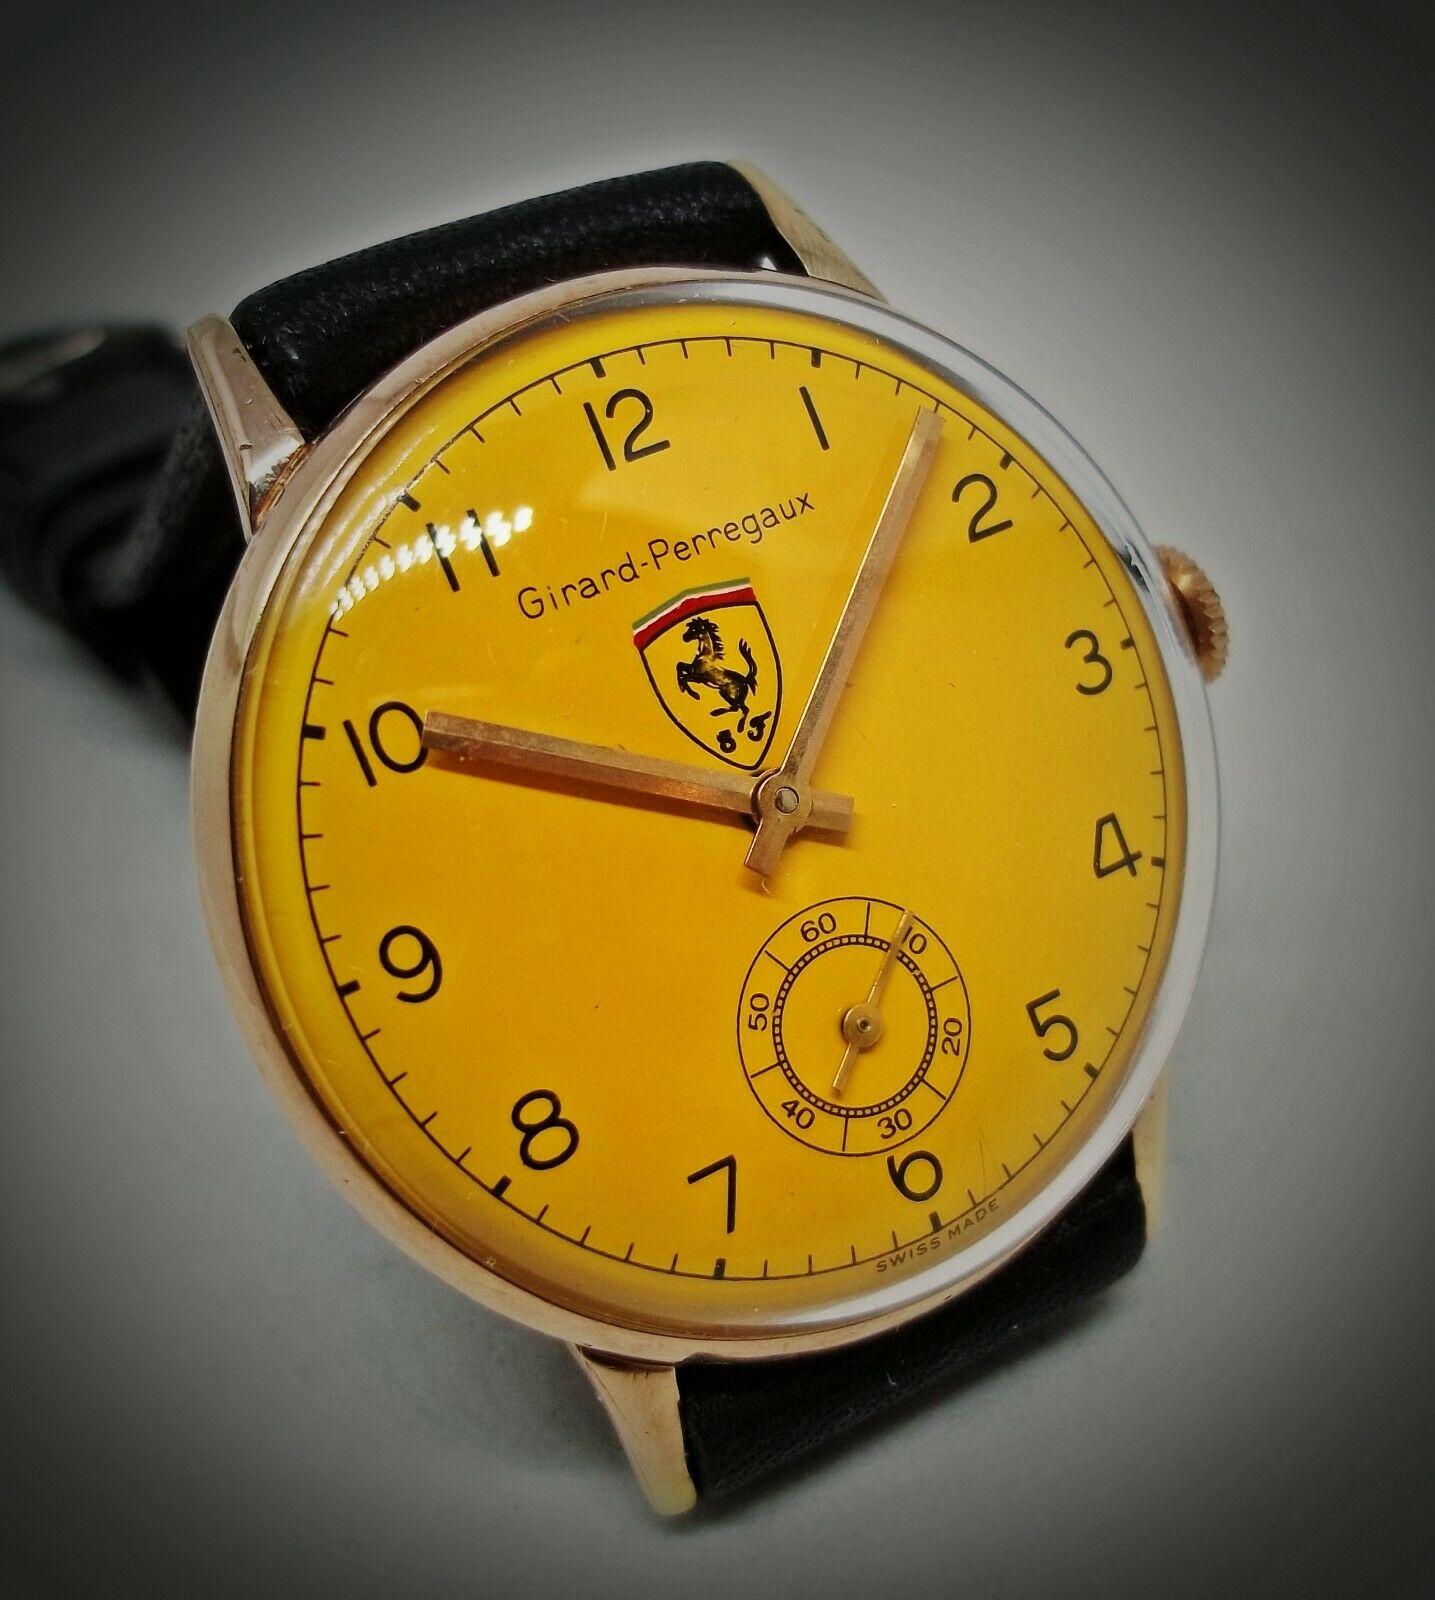 Lot 22 - Rare Vintage Girard Perregaux Ferrari ManÕs Watch